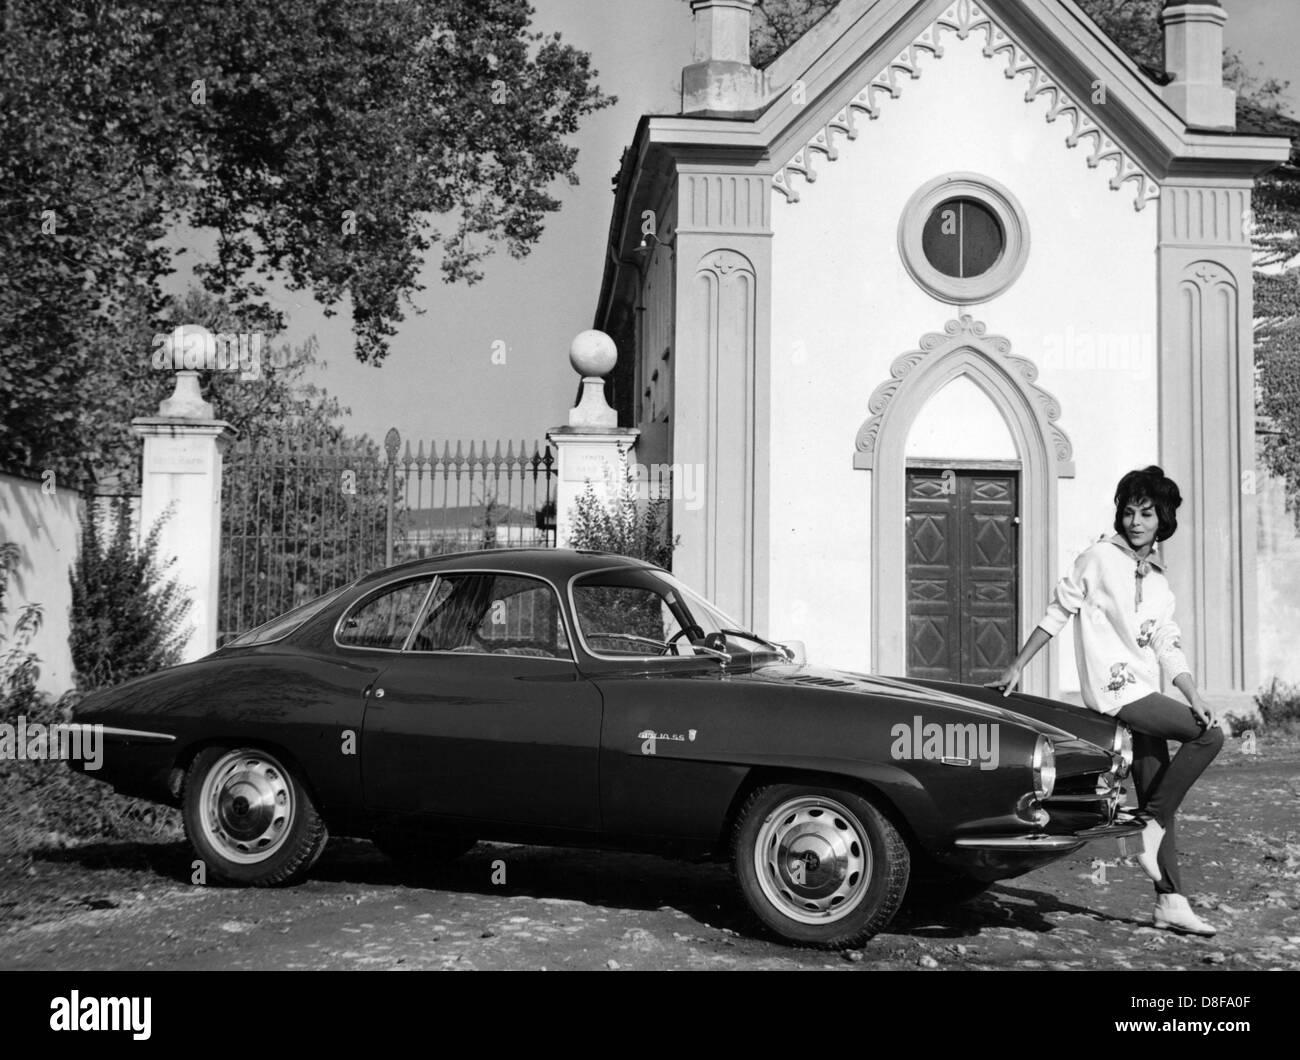 1965 Alfa Romeo Giulia Sprint Speciale Imagen De Stock